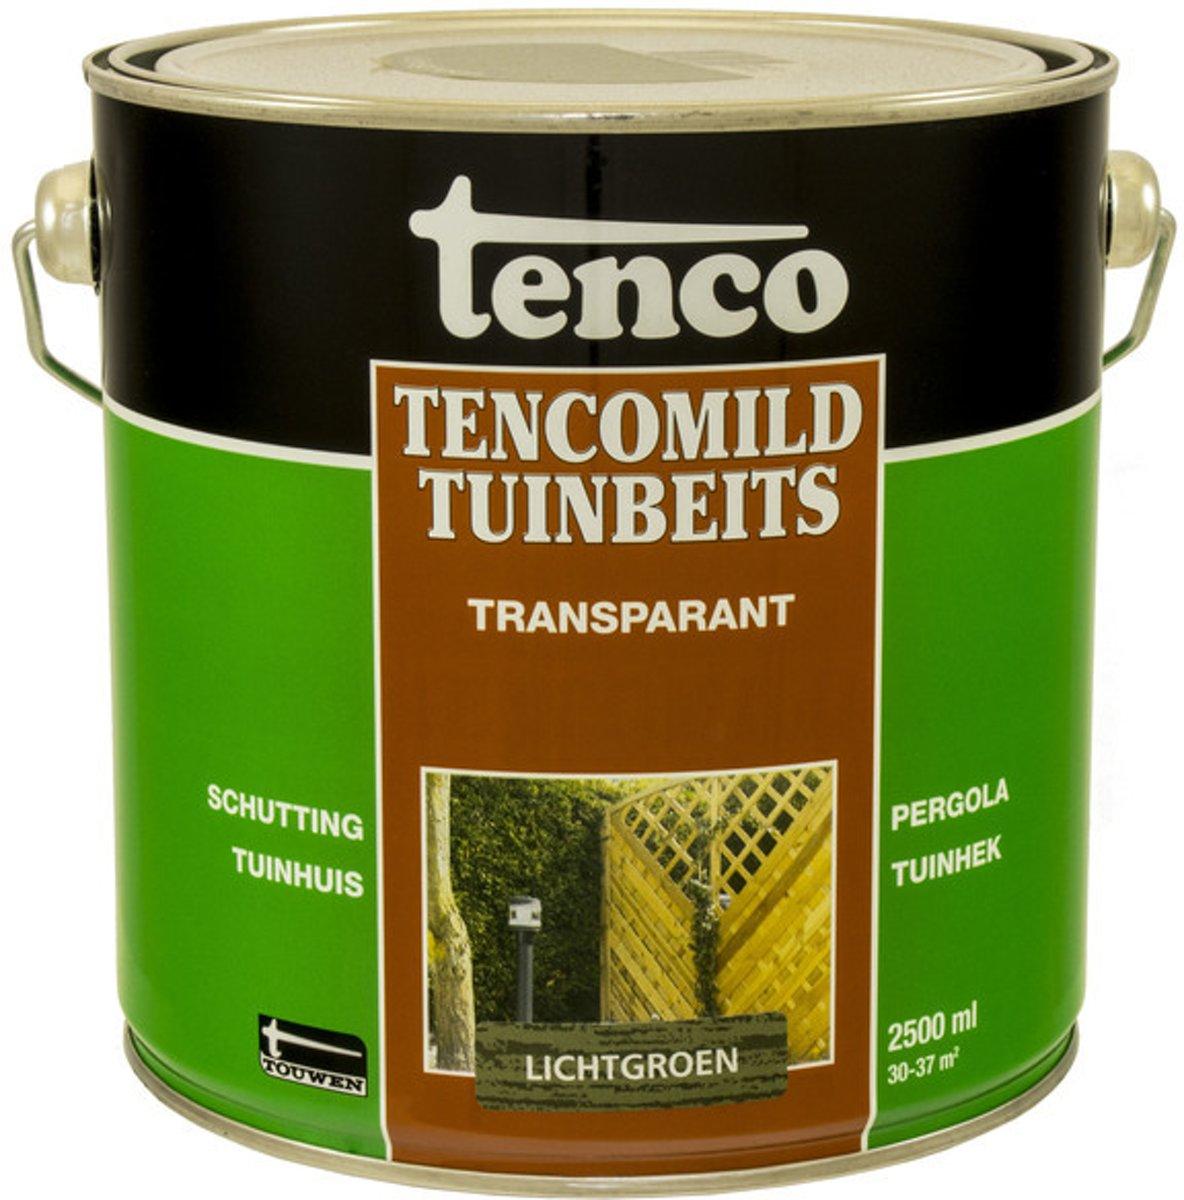 Tenco Tencomild Transparante Tuinbeits - 2,5 liter - Lichtgroen